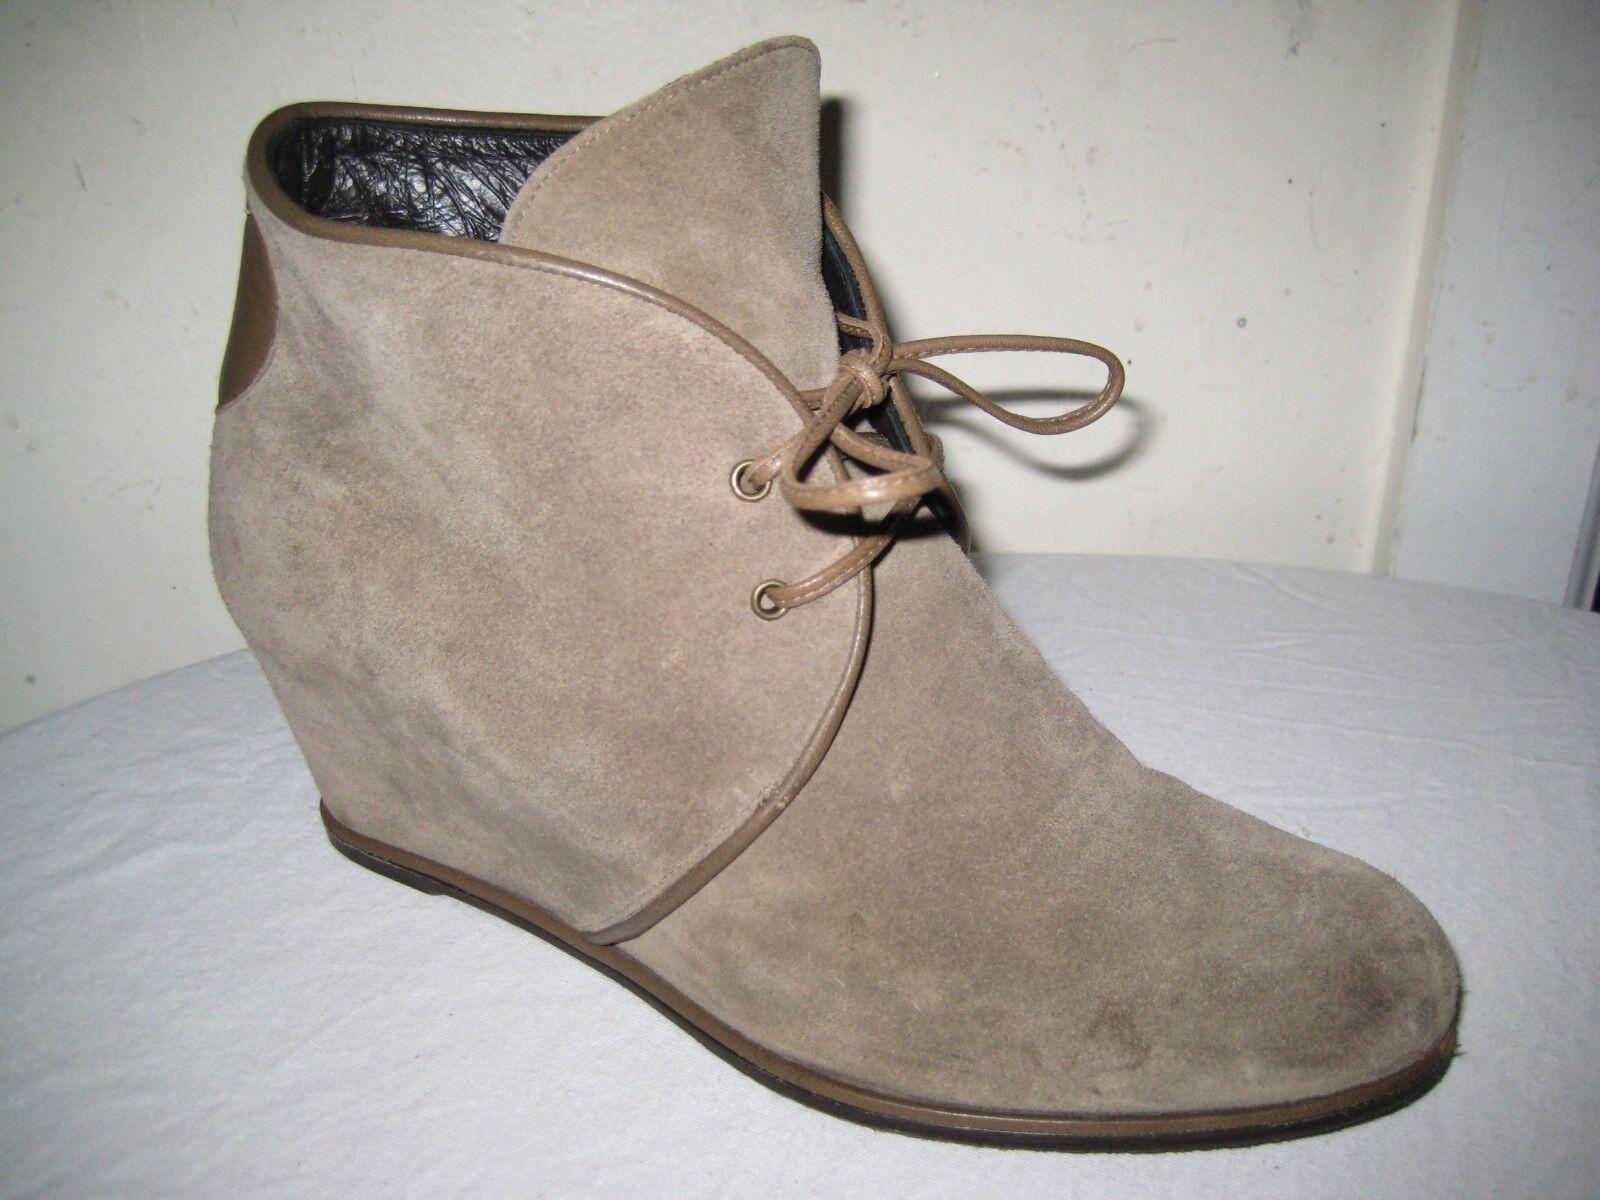 Stuart Weitzman Kalahari Hidden Wedge Suede Lace Up Boots shoes Size 9 M.